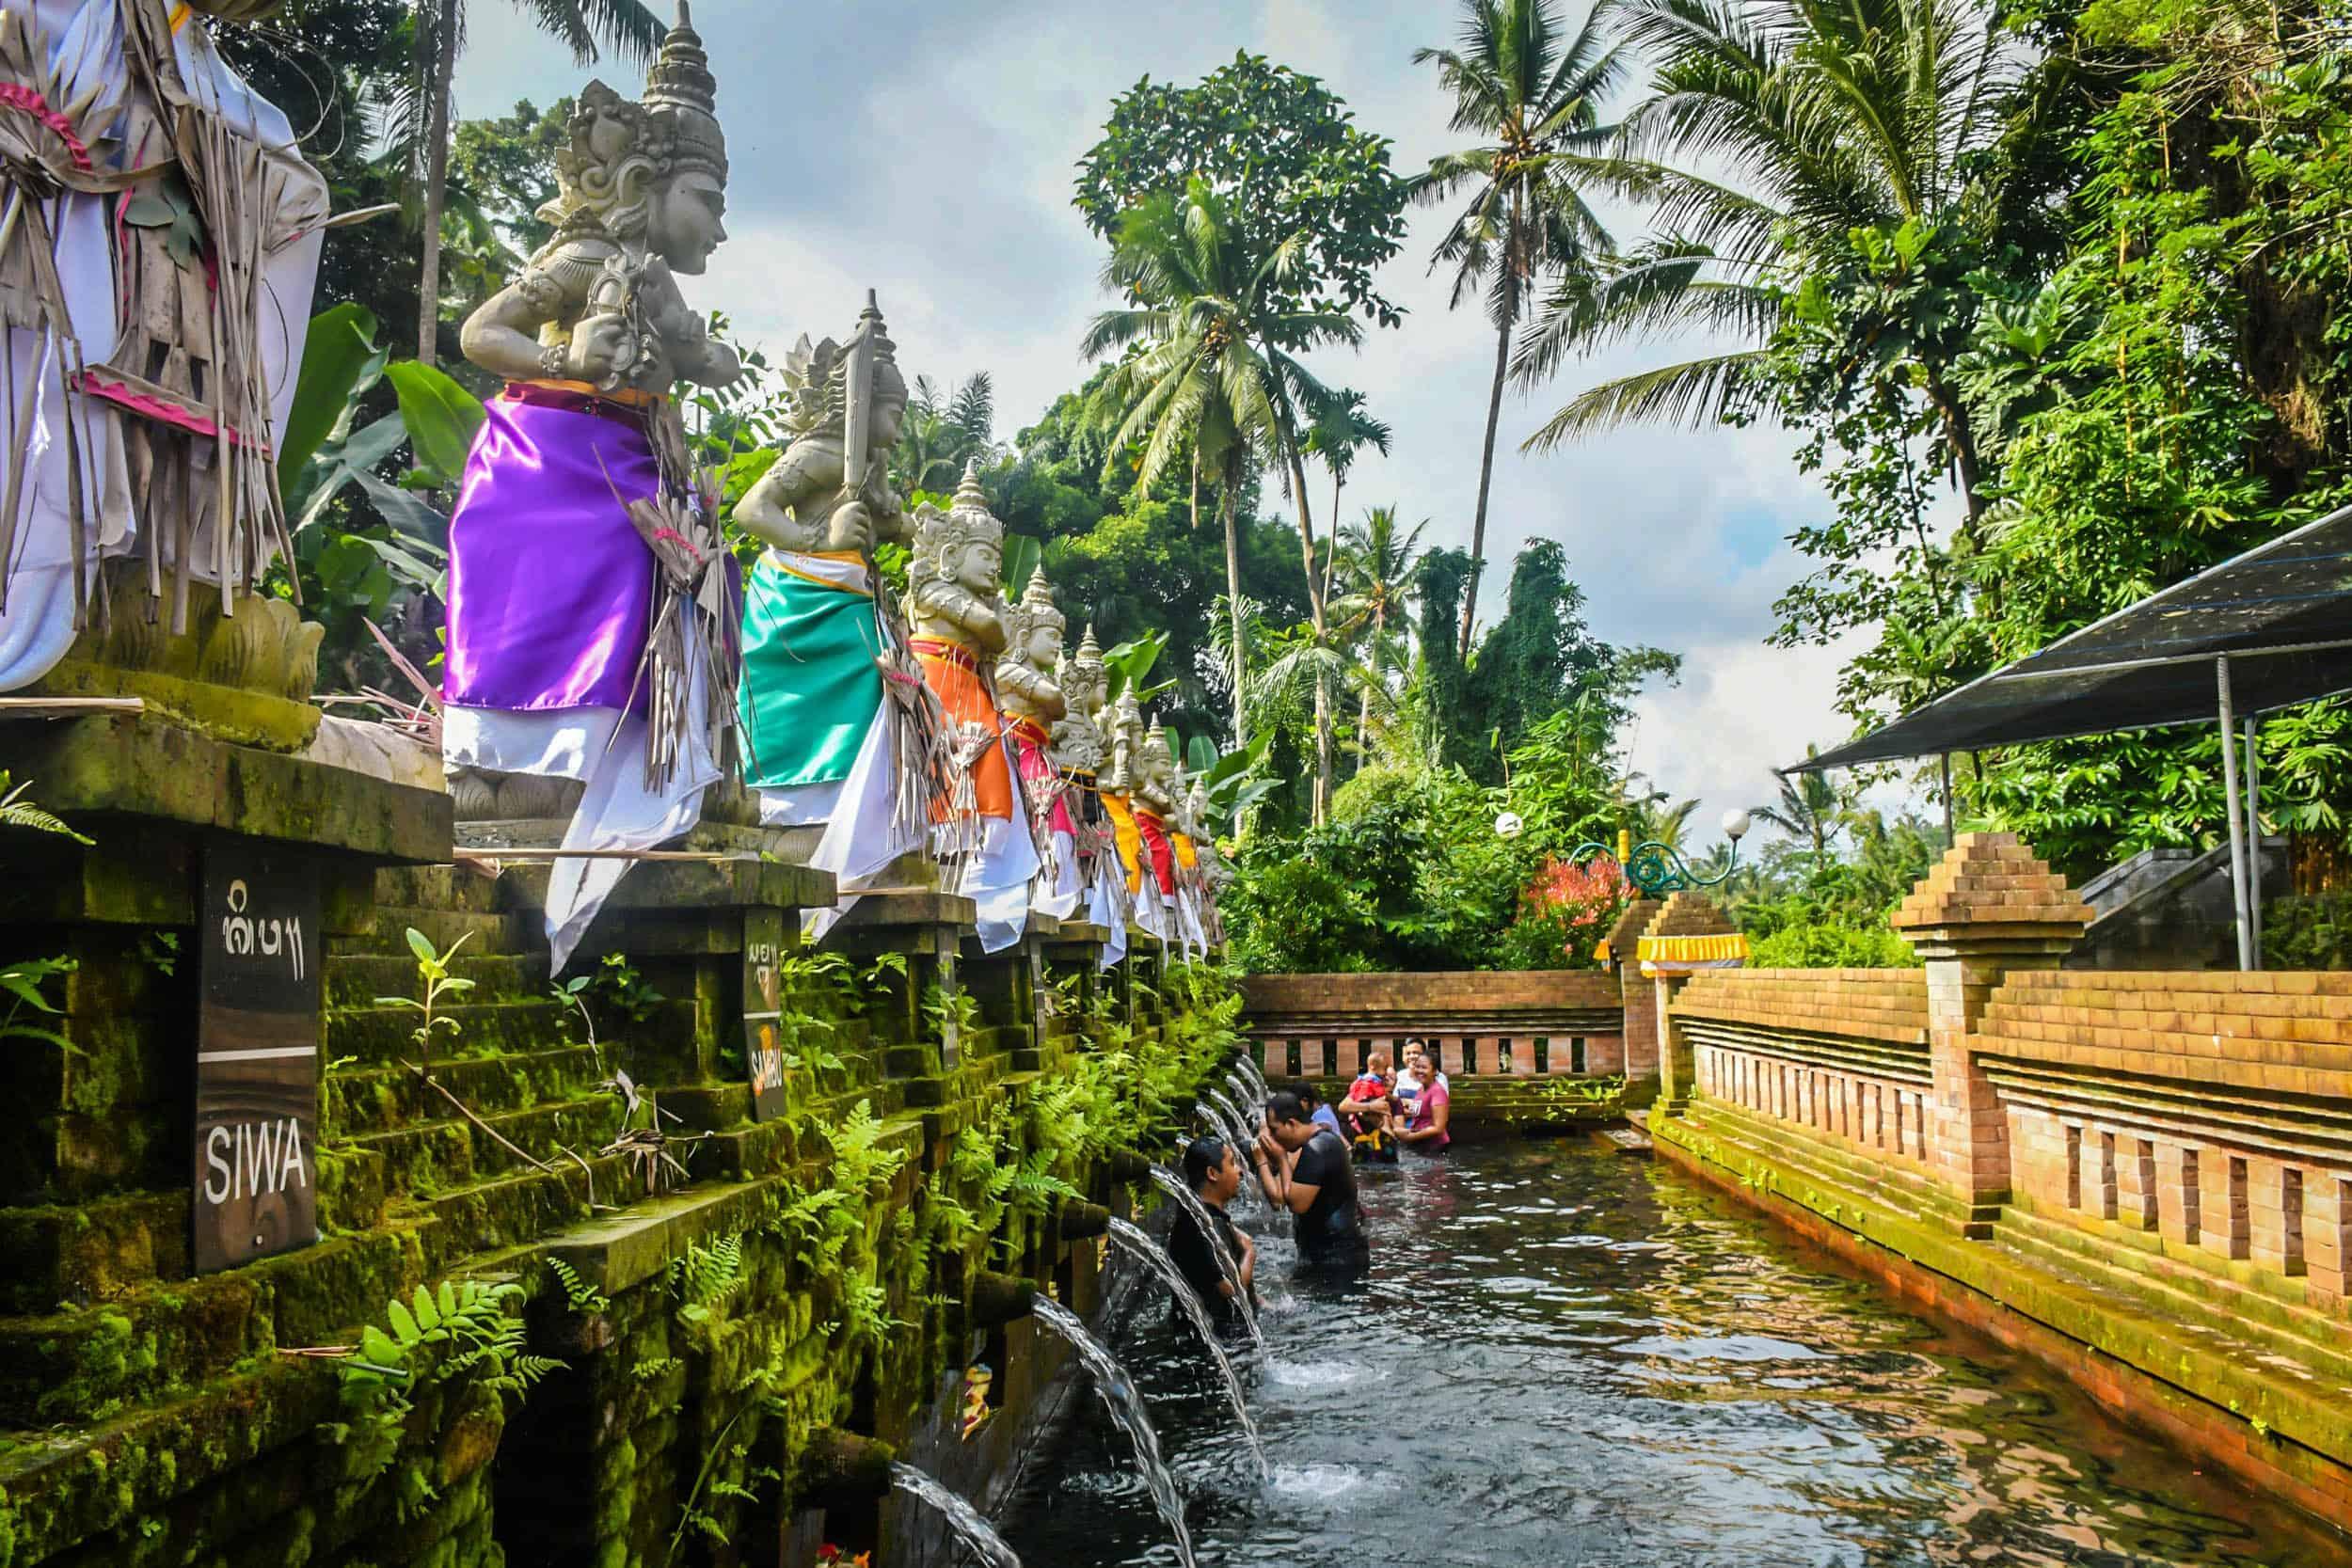 10 Must-Do Activities in and around Ubud, Bali